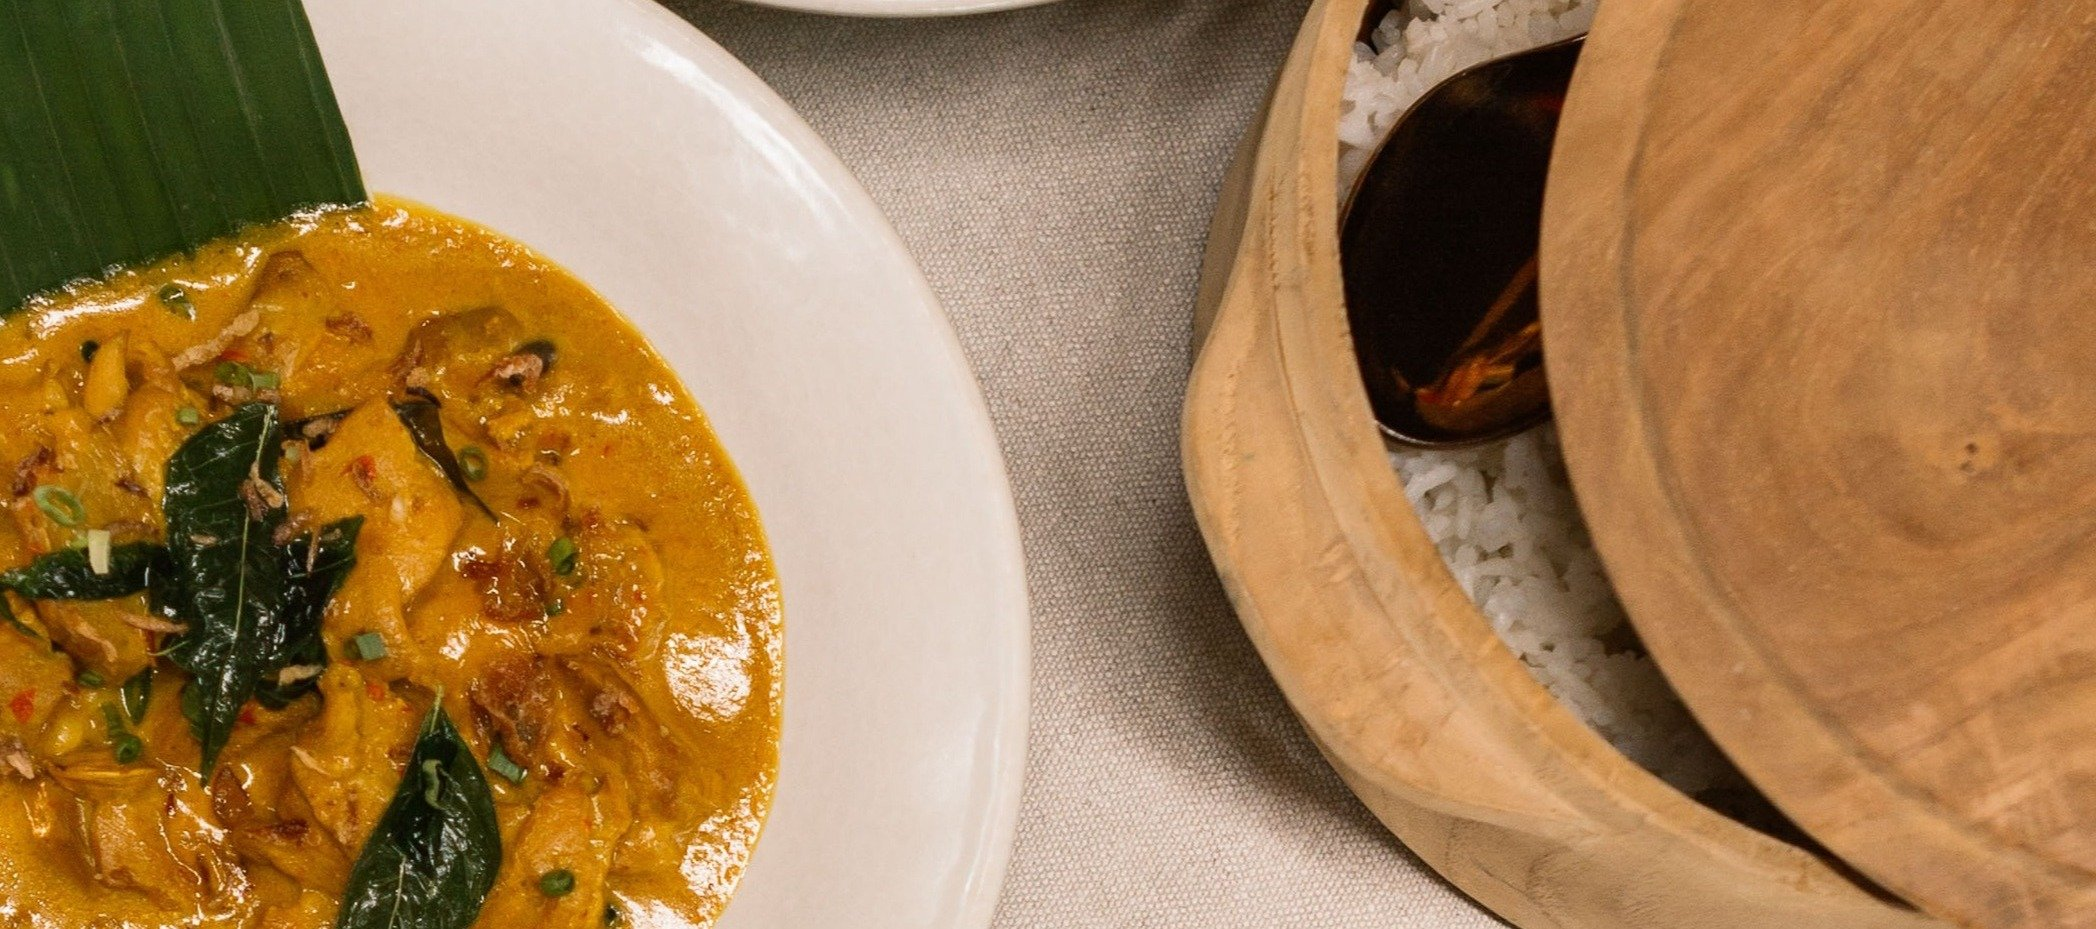 kalio_curry_sambal_beef_rendang_rice_treetops-jpg-1-1-1